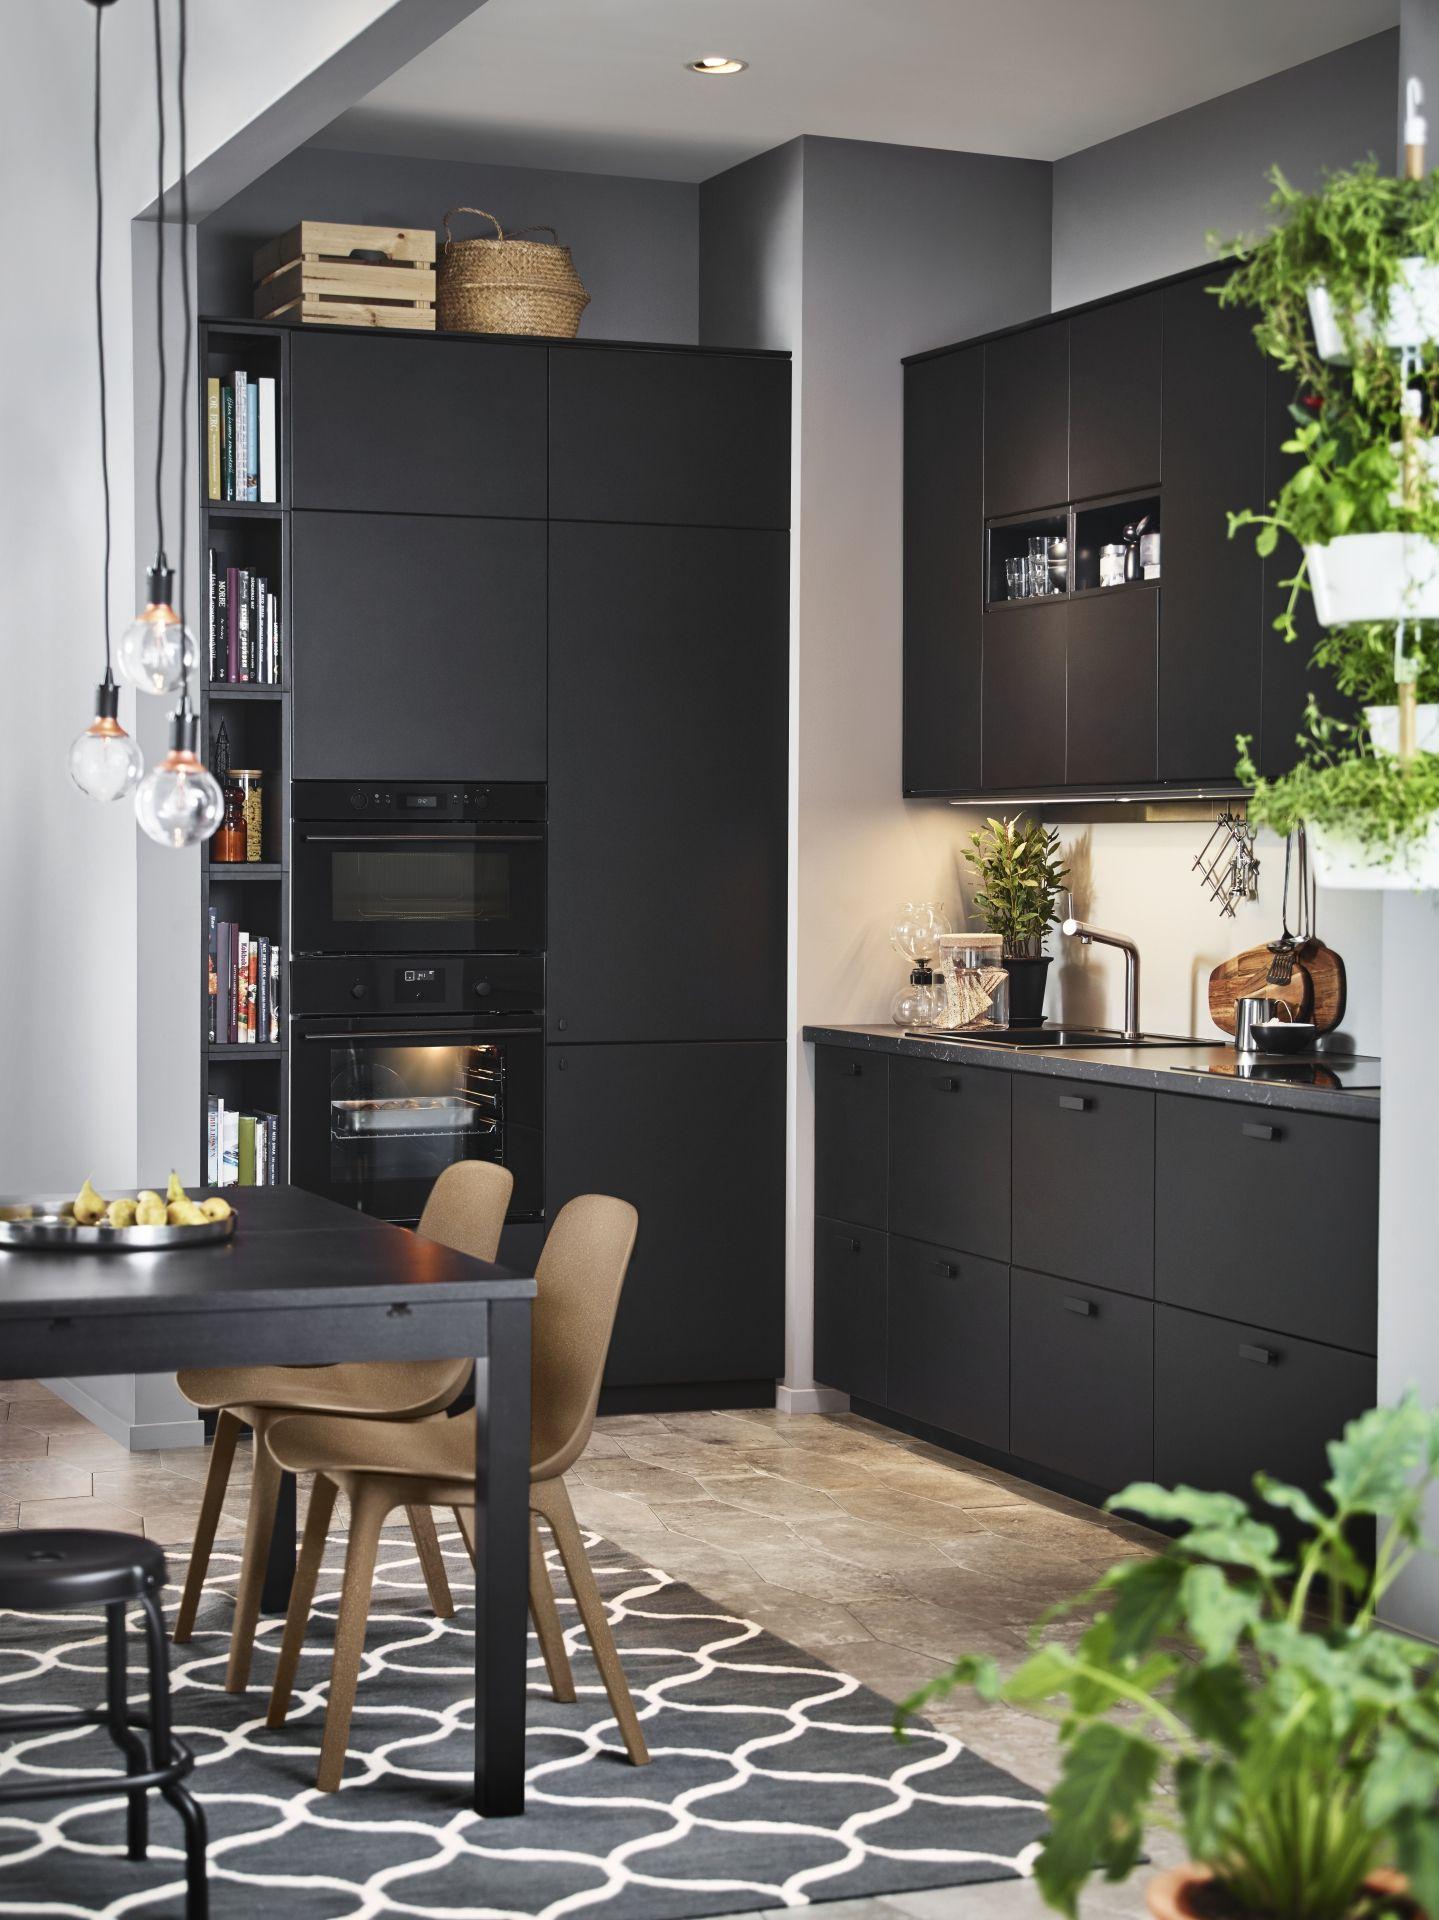 METOD/KUNGSBACKA keuken IKEA IKEAnl IKEAnederland